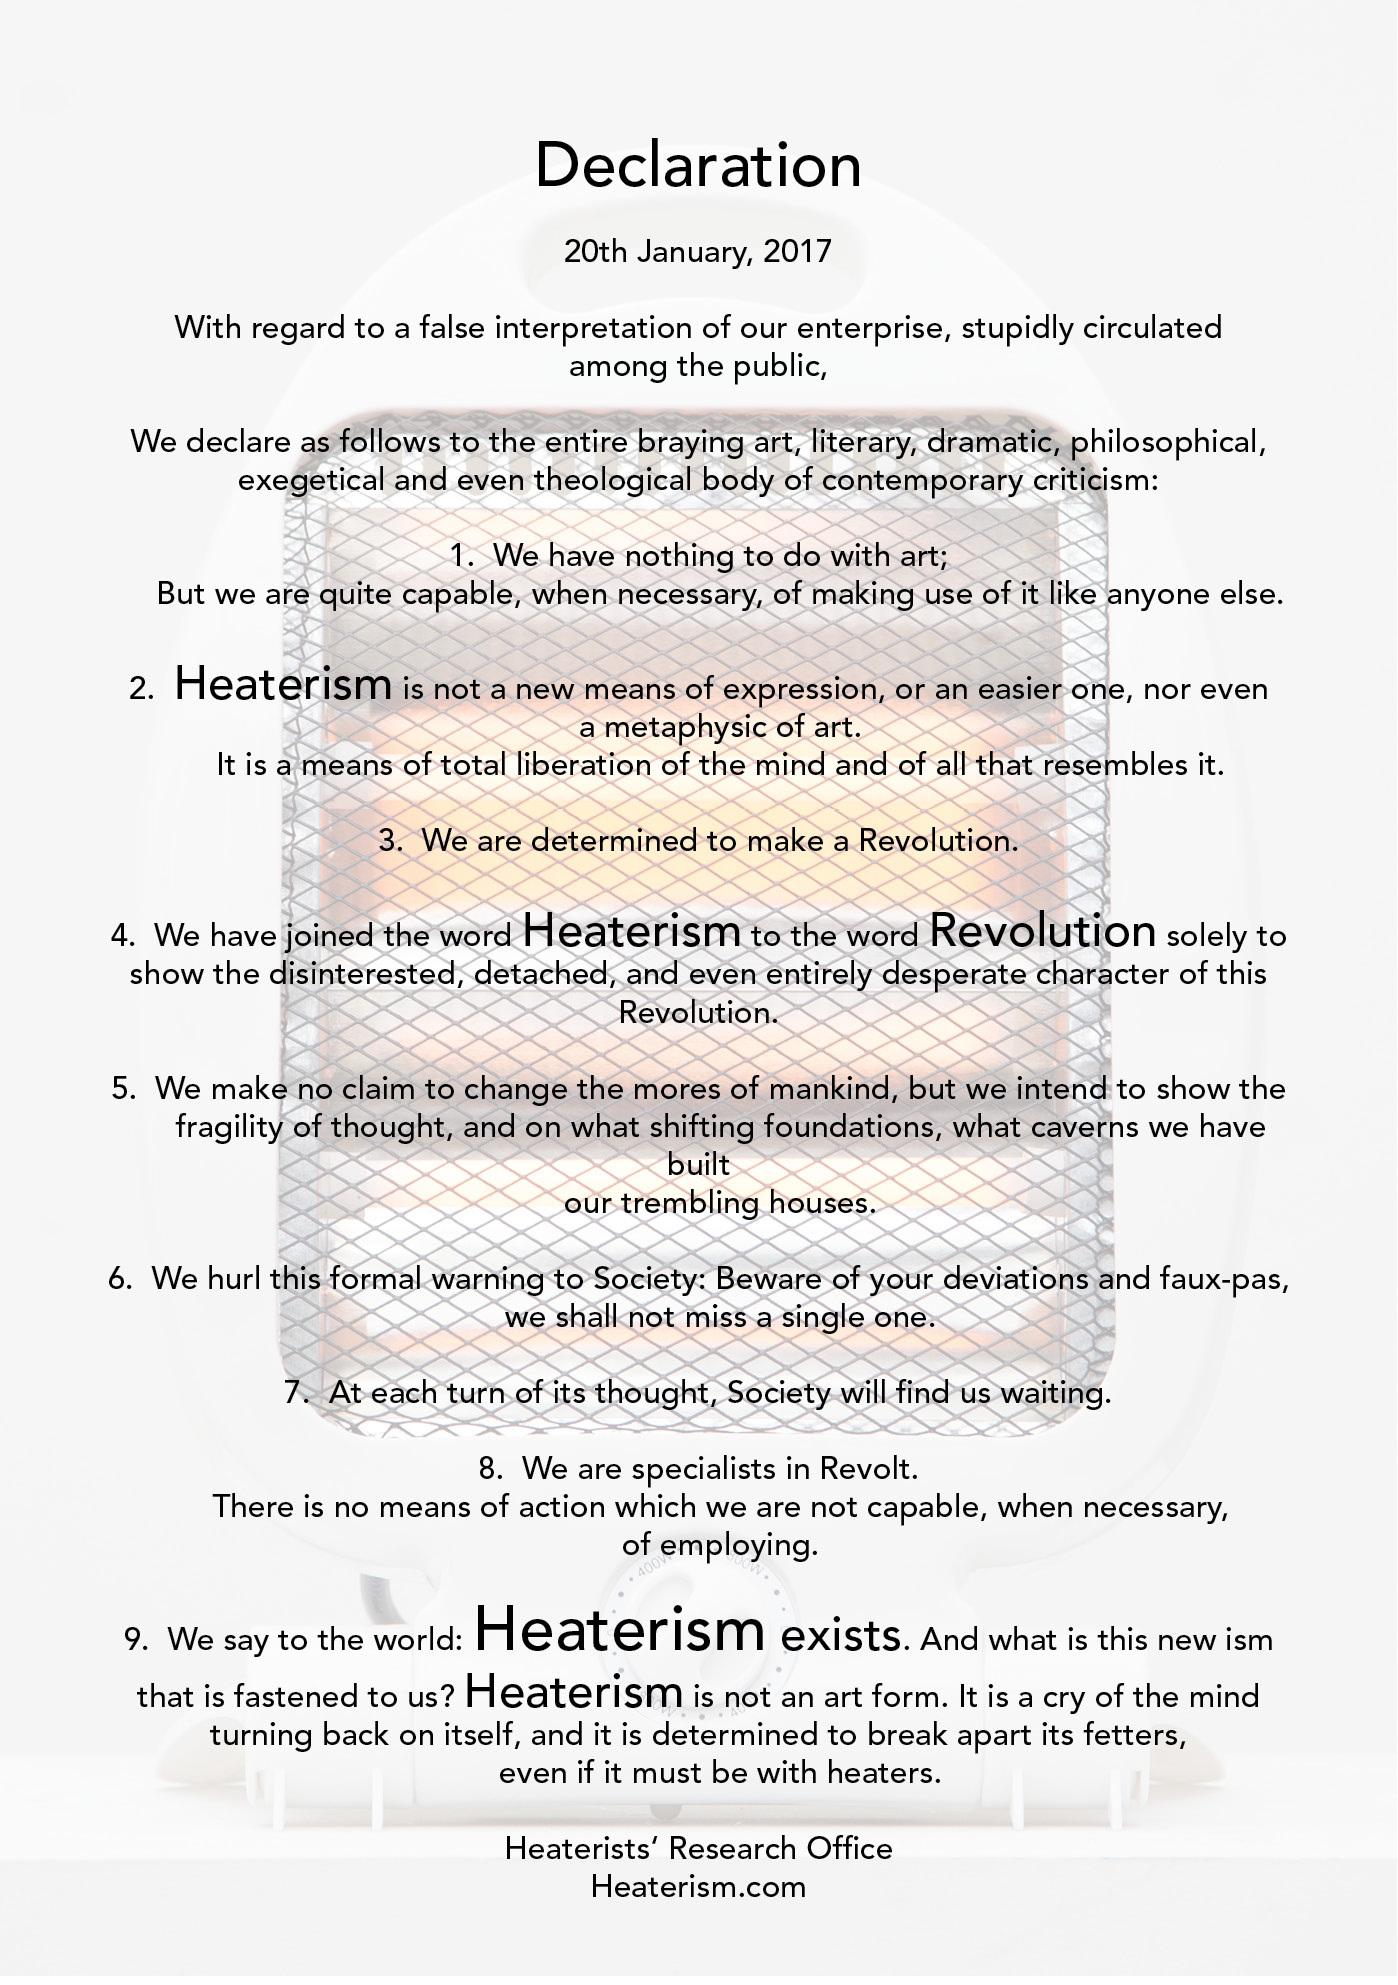 Heaterist Declaration, Ralf Pflugfelder, 2017.